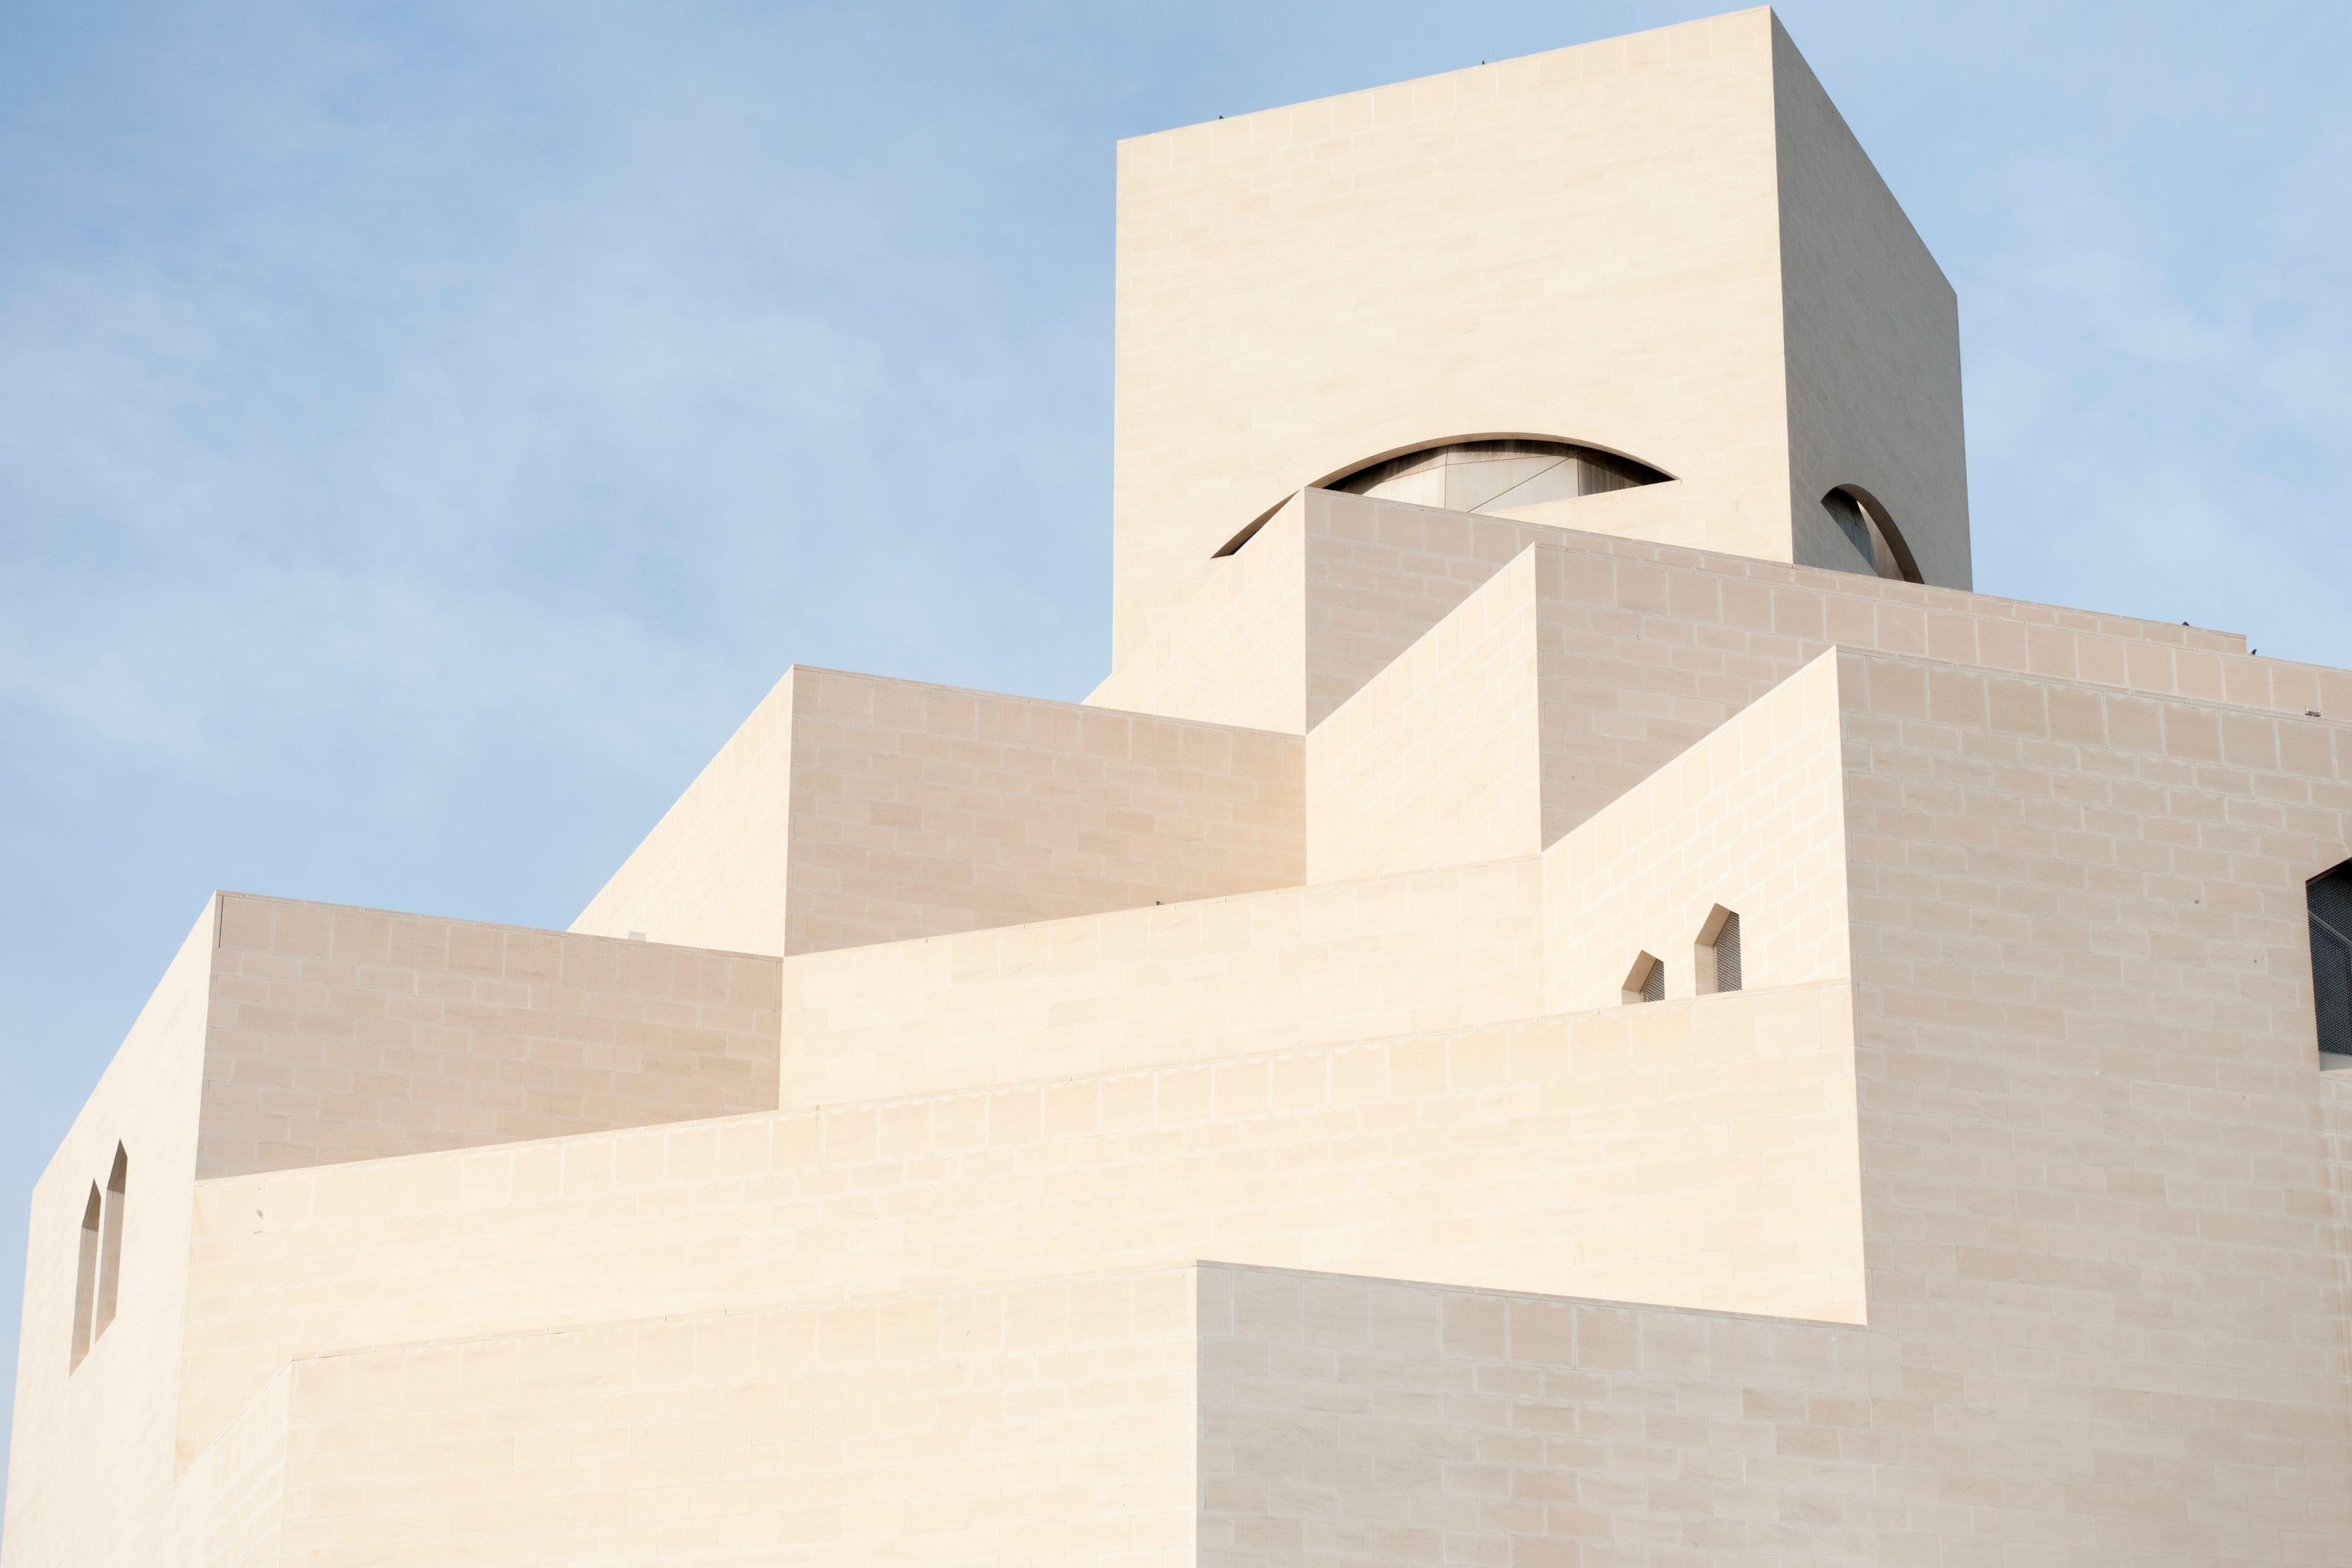 The exterior of minimalist, pure white Museum of Islamic Art